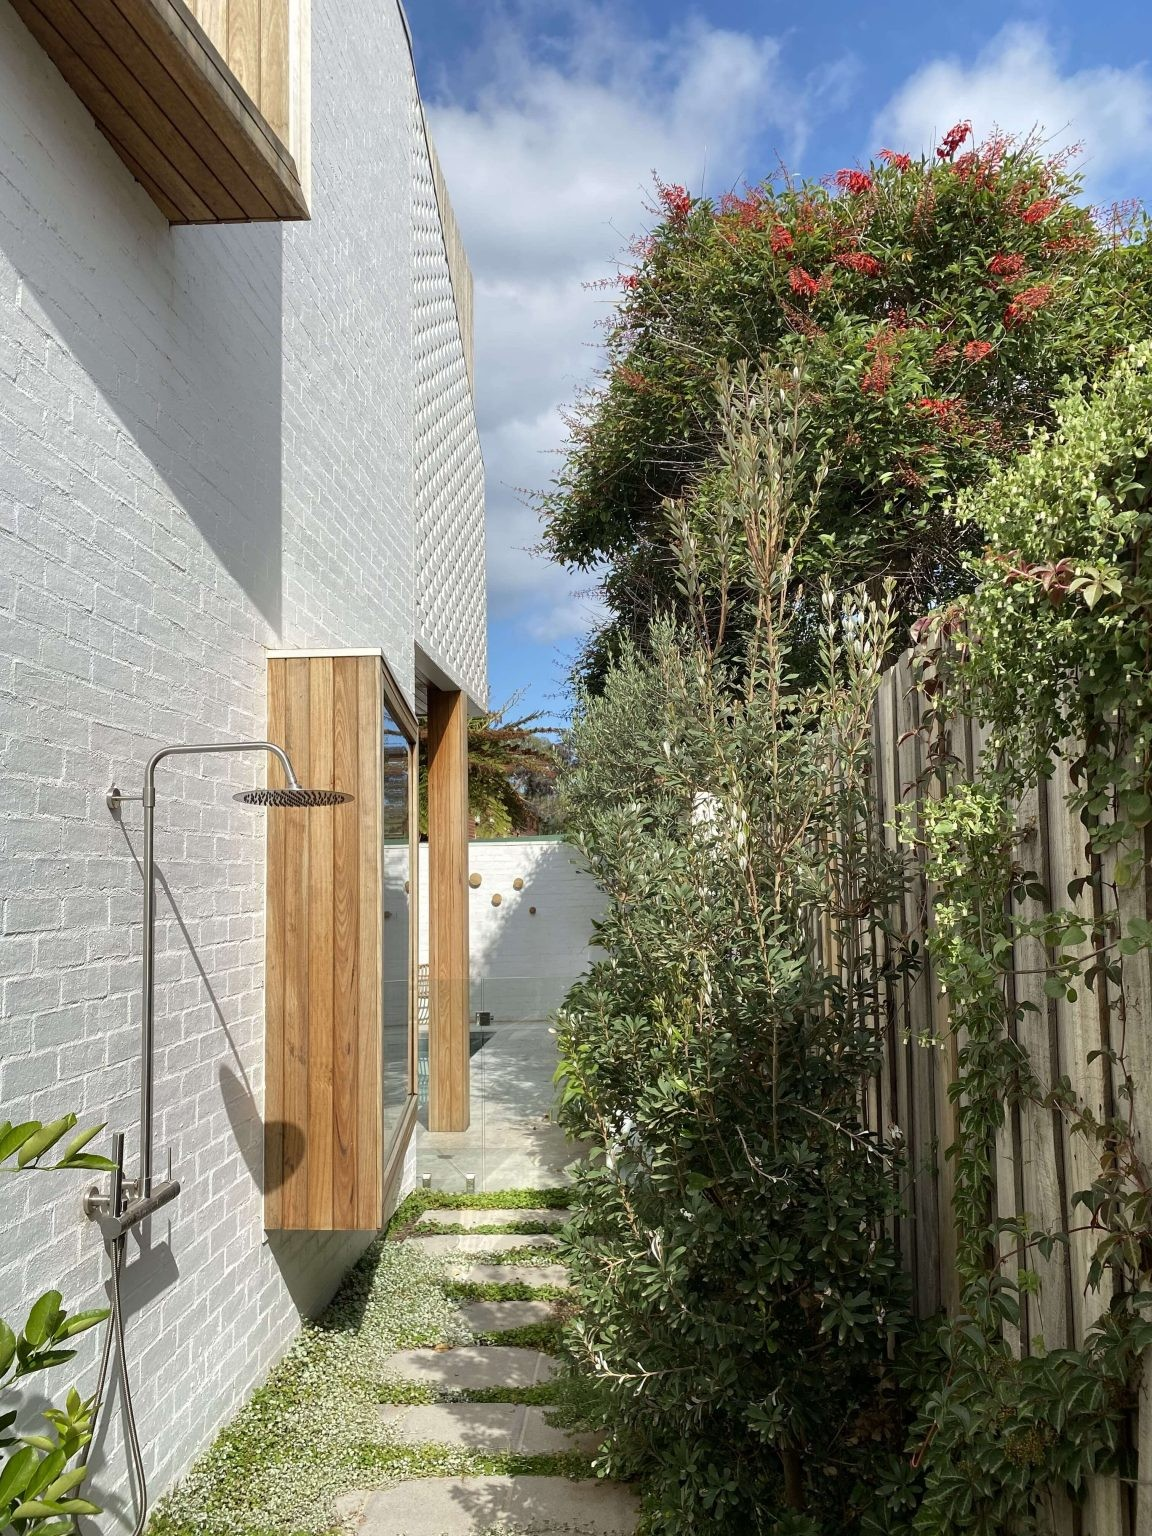 elsternwick-house-by-star-architecture-elsternwick-vic-australia-image-01-1152x1536.jpg